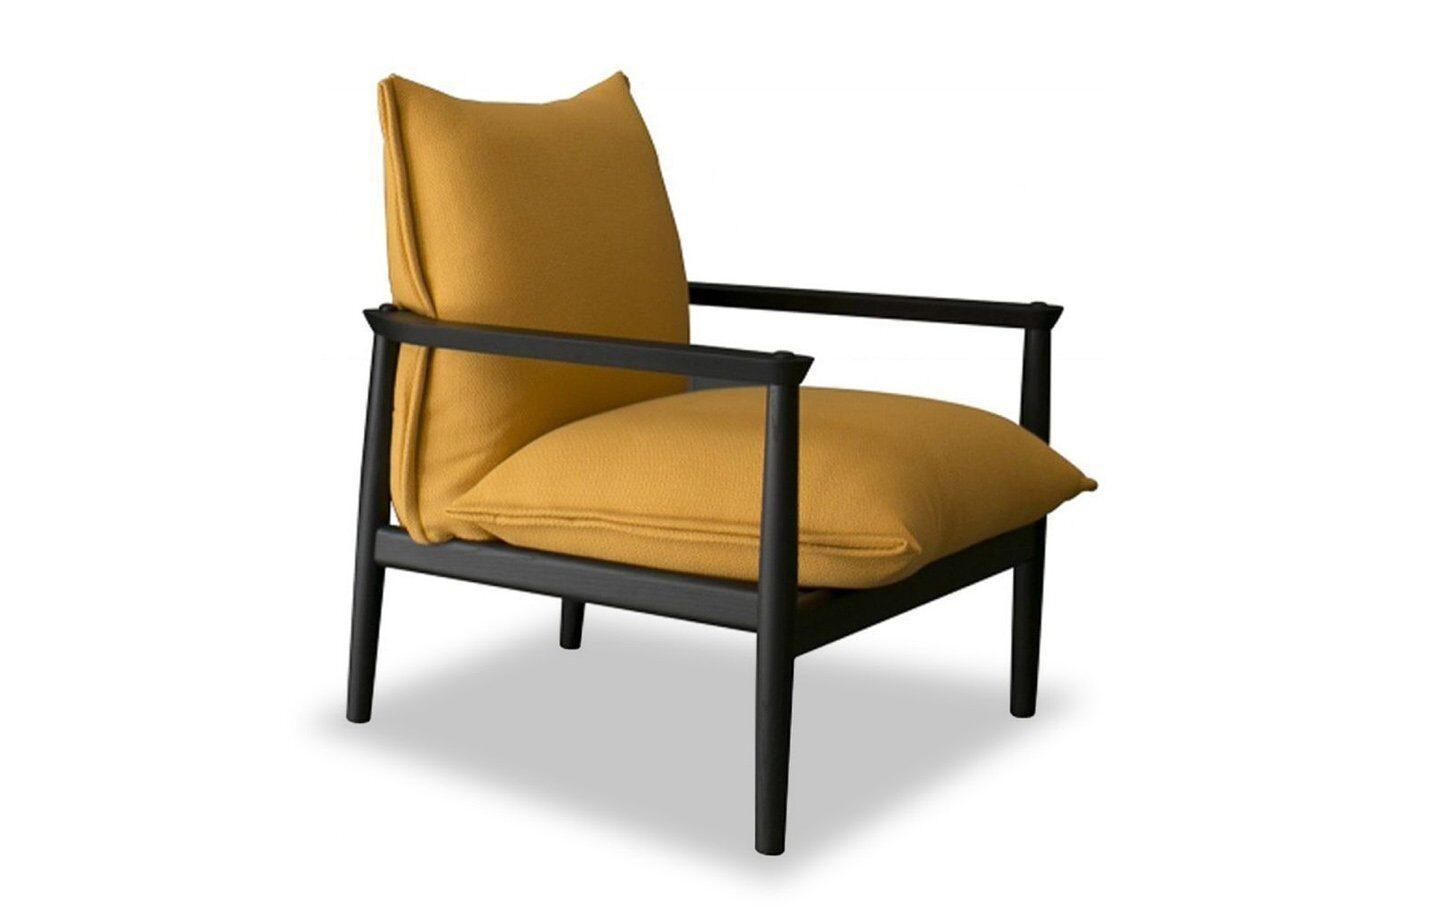 Sergia-designer-lounge-Armchair-wood-01